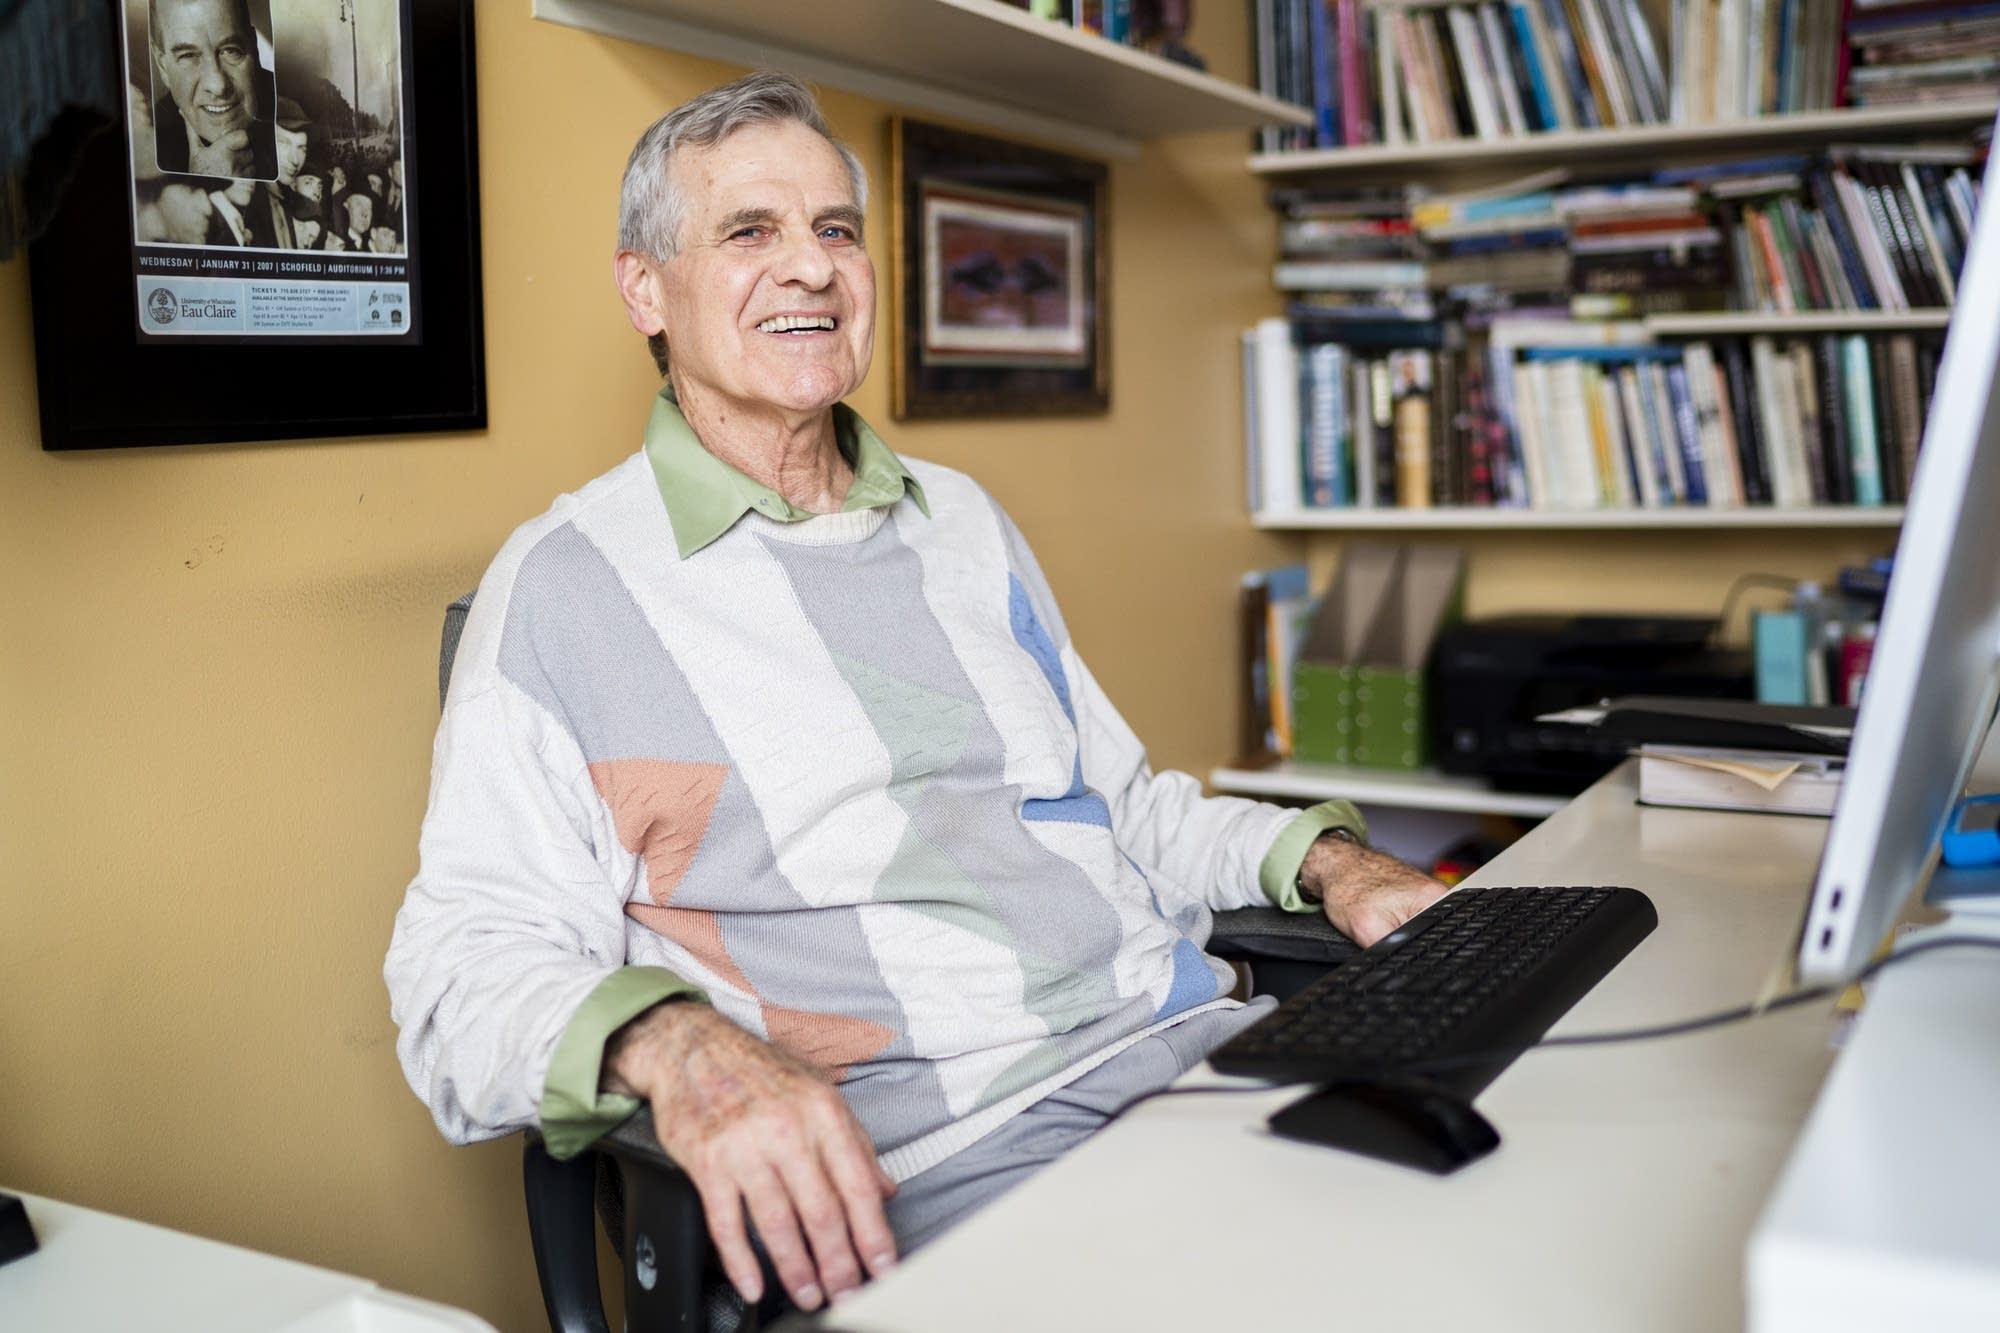 Author Michael Fedo sits for a portrait inside his Coon Rapids, Minn. home.